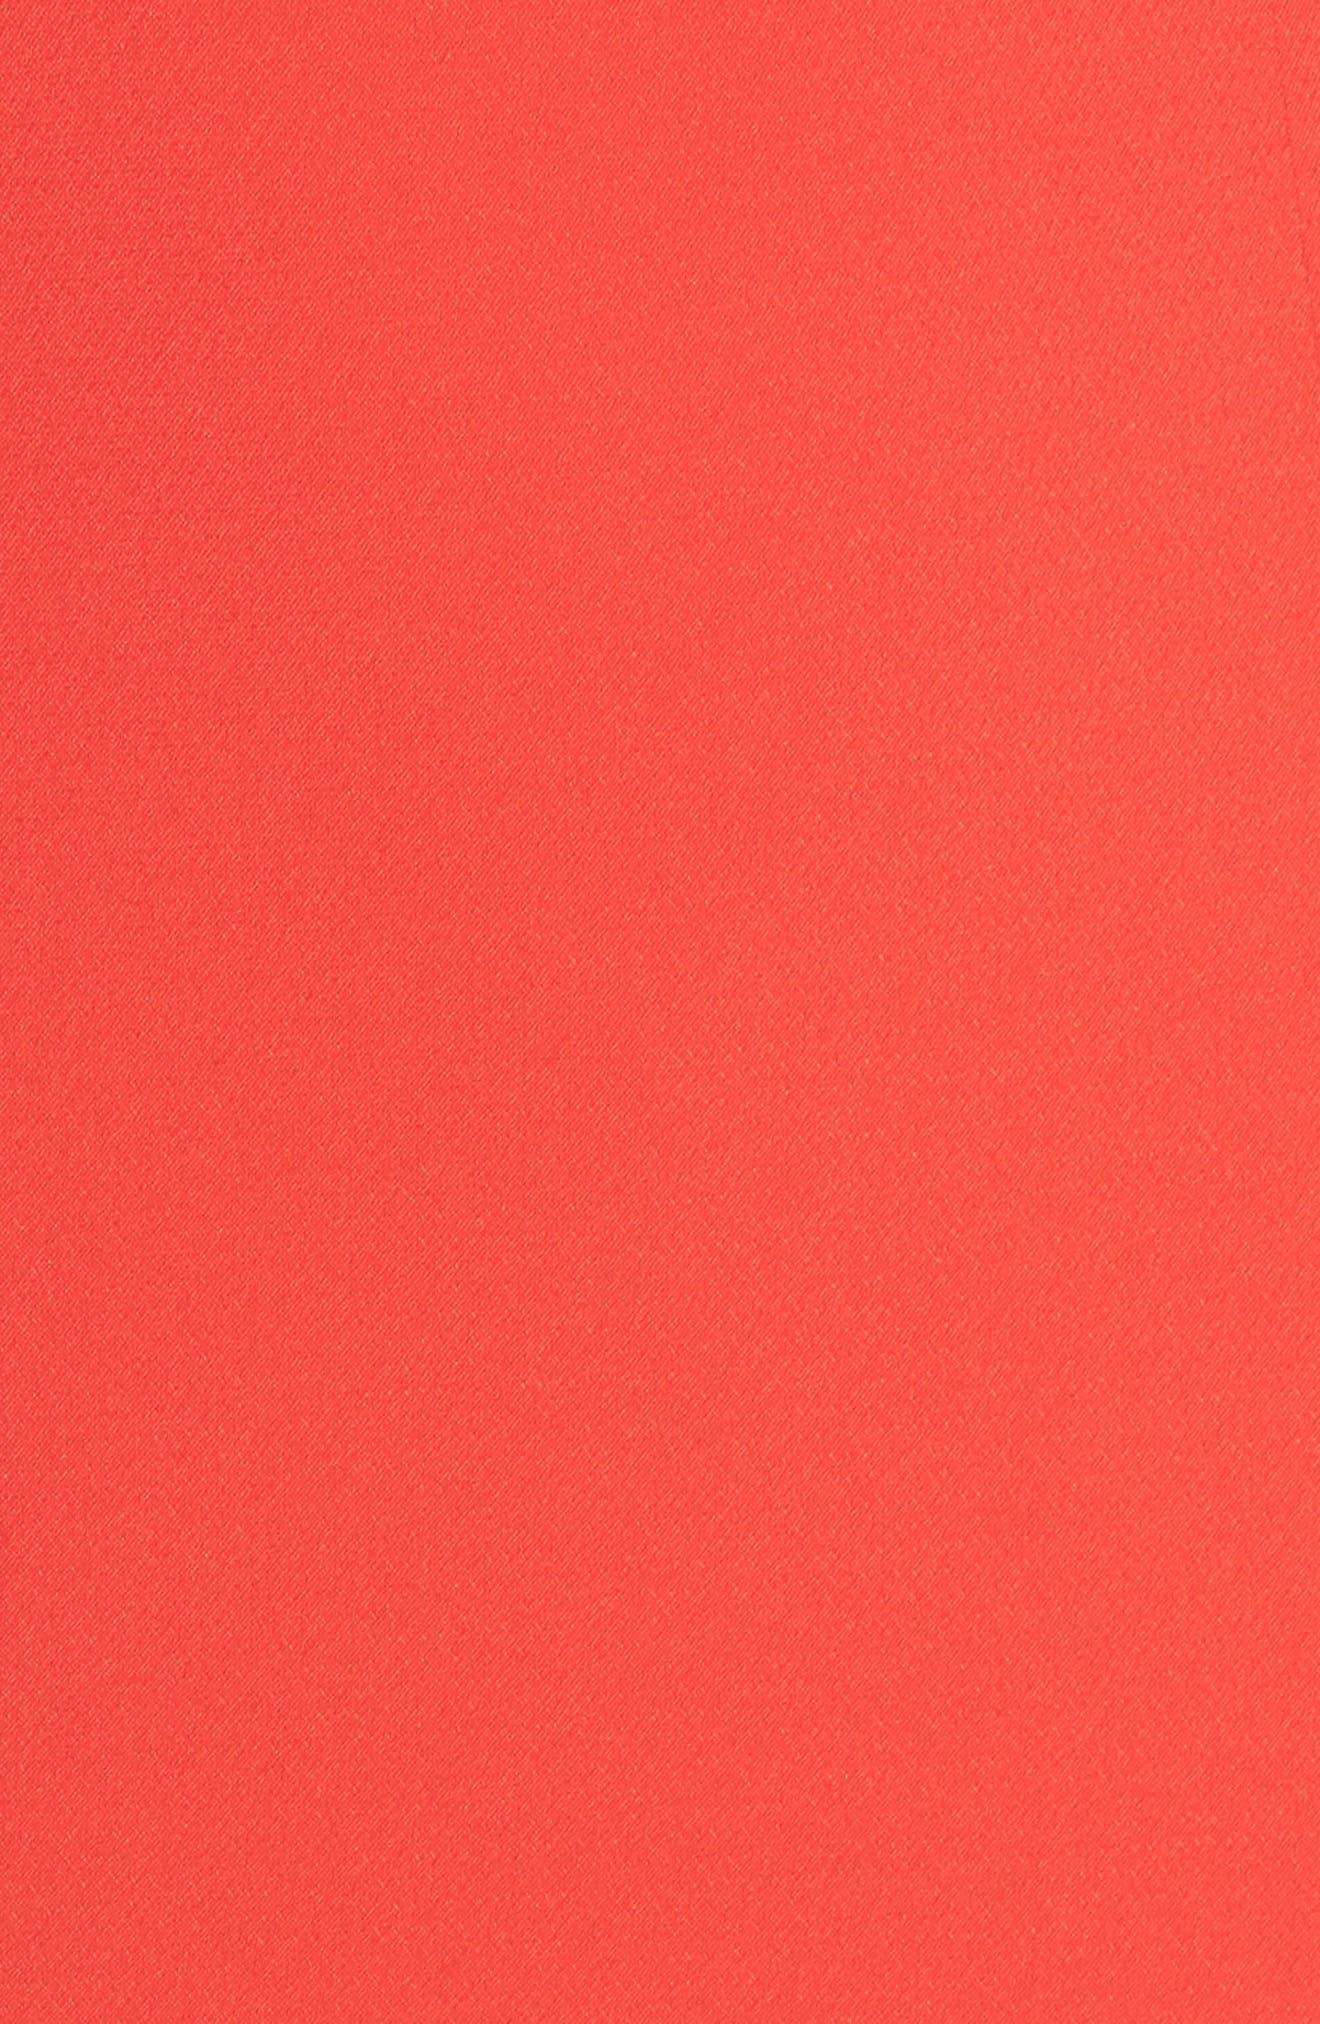 Crepe Popover Halter Gown,                             Alternate thumbnail 5, color,                             602